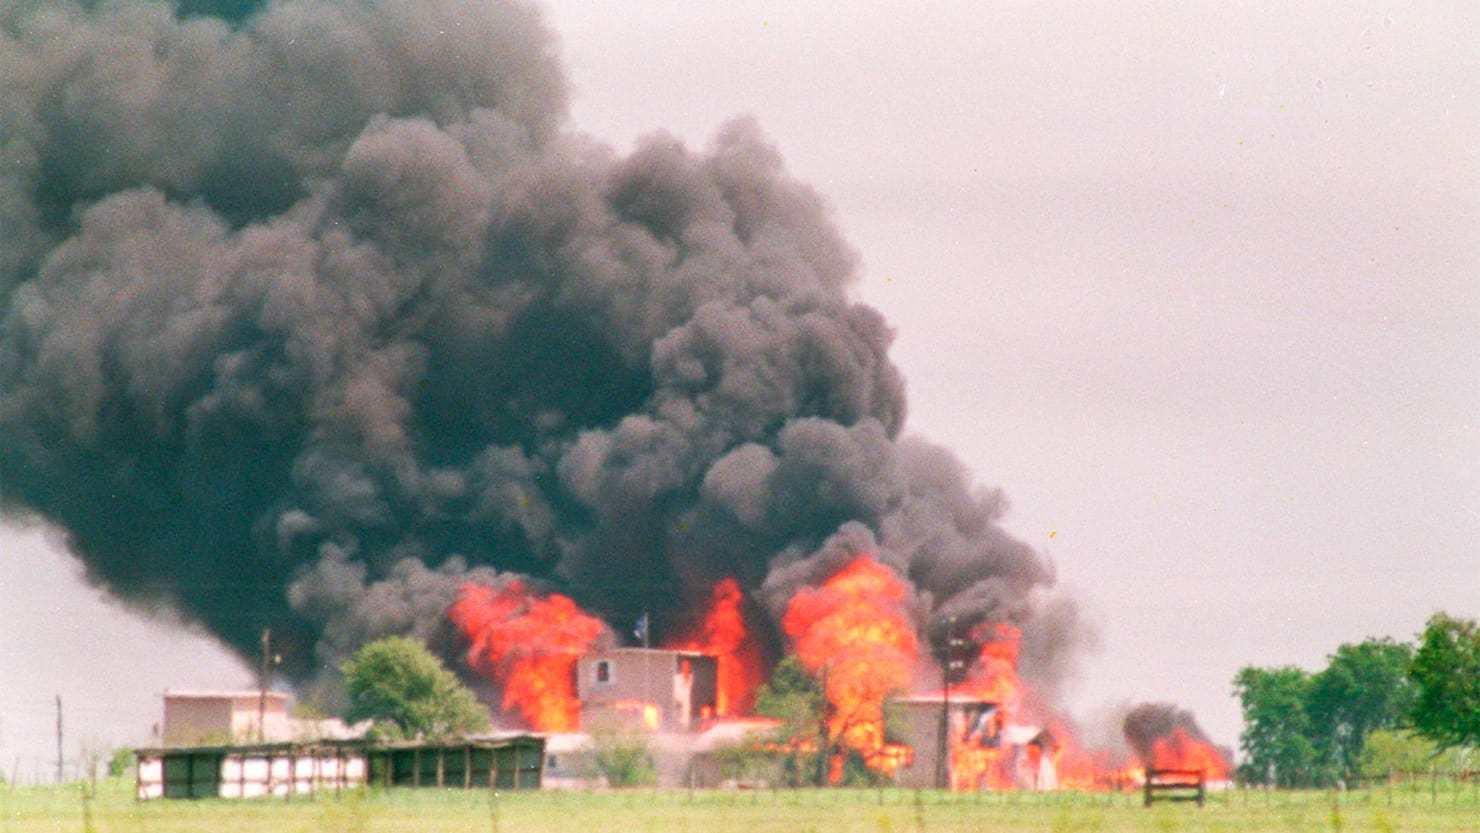 """The Waco Raid at 25: Enough With the Fairy Tale Lies"""